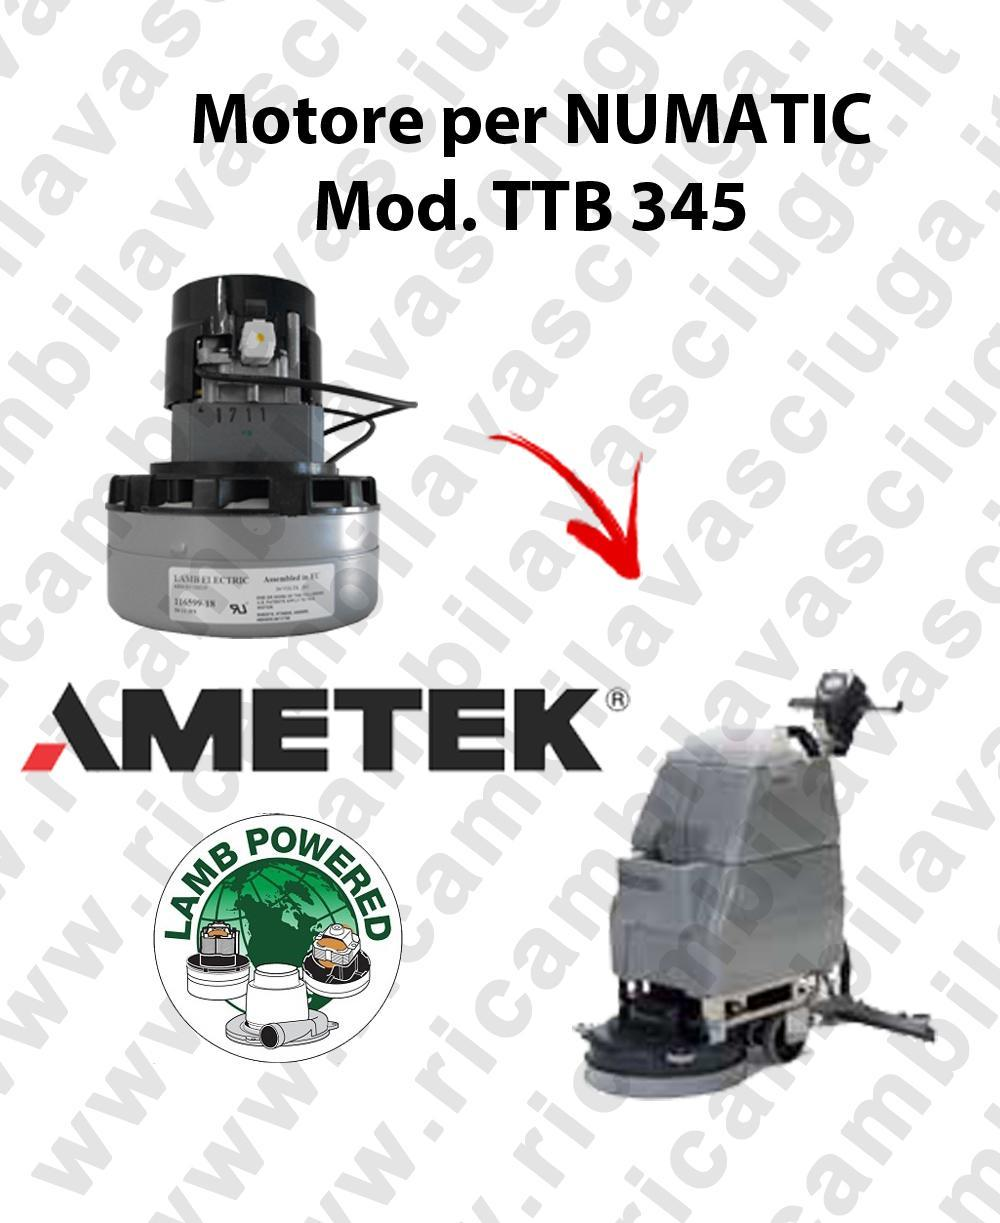 TTB 345 Saugmotor AMETEK für scheuersaugmaschinen NUMATIC